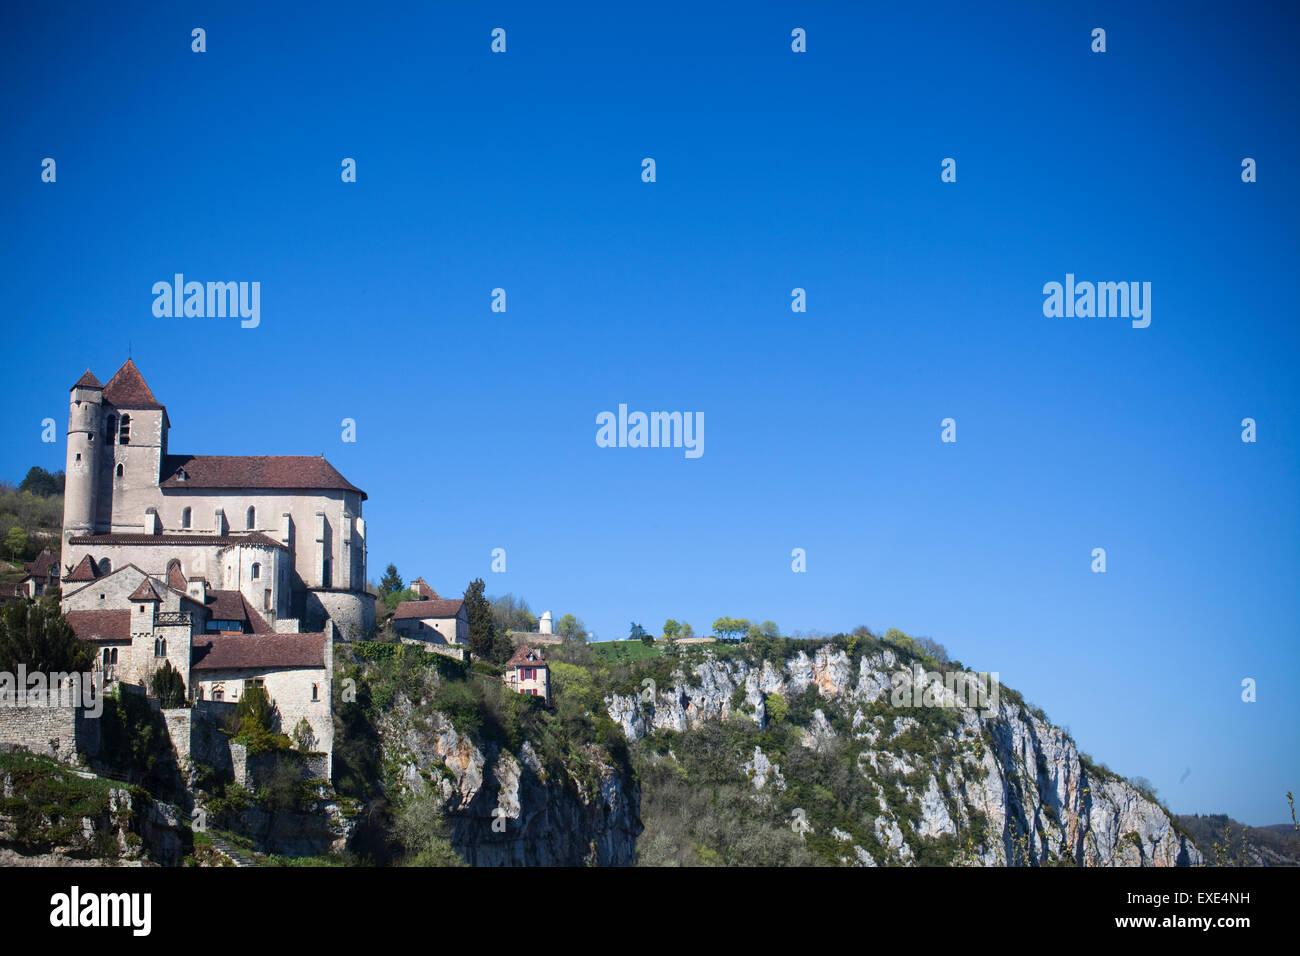 St Cirq Lapopie France Europe - Stock Image